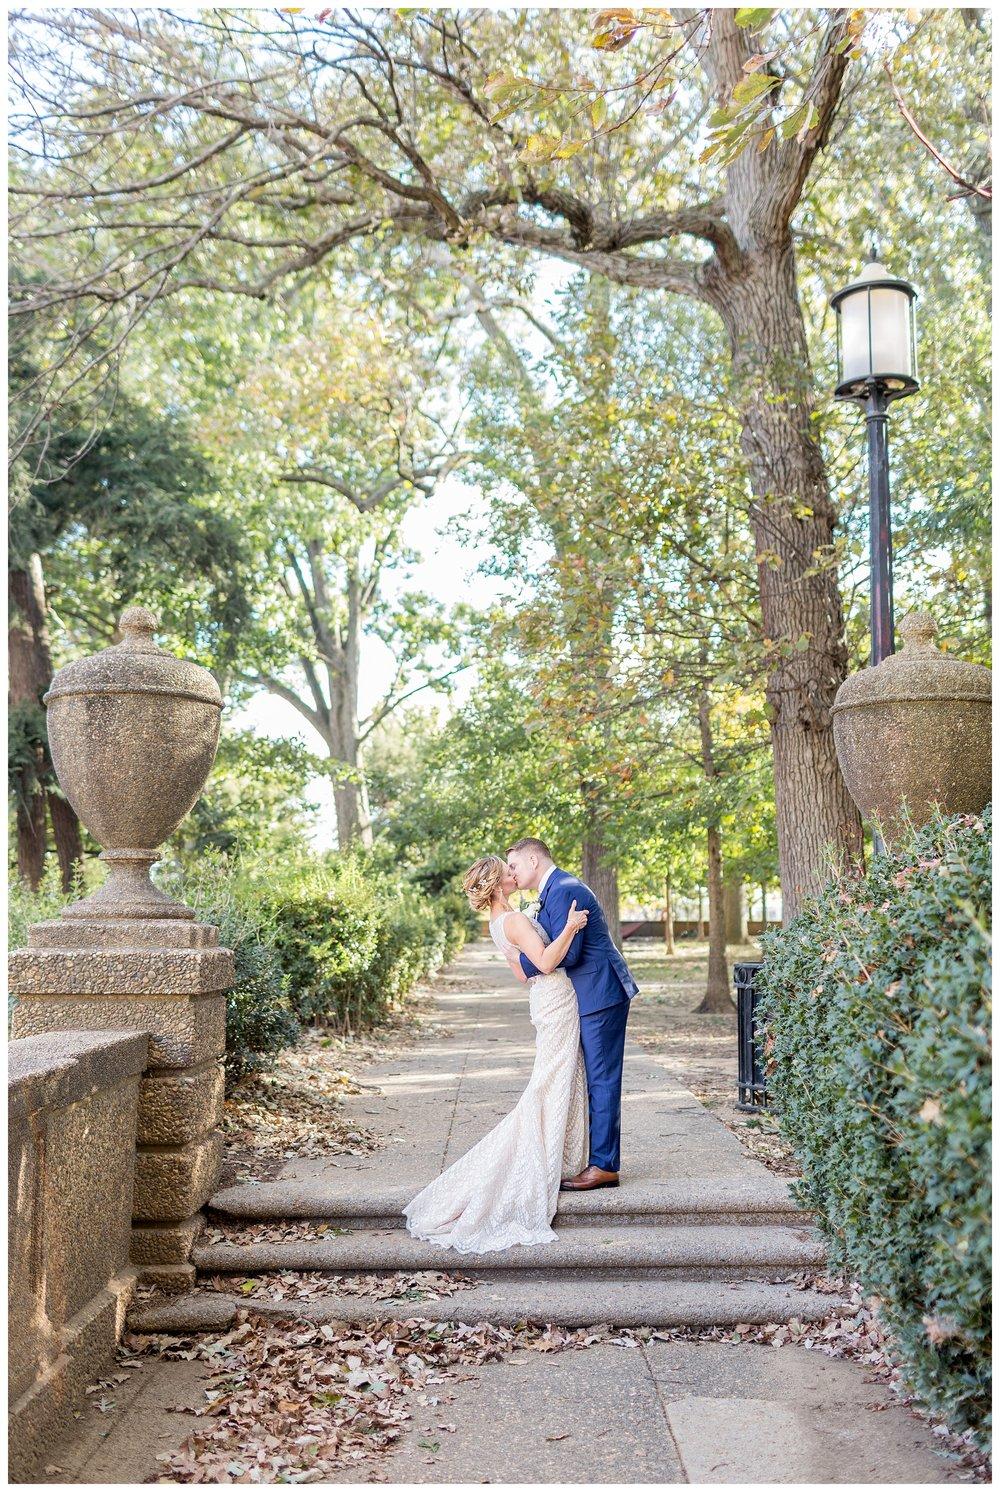 Meridian Hill Park Wedding | Washington DC Wedding Photographer Kir Tuben_0037.jpg